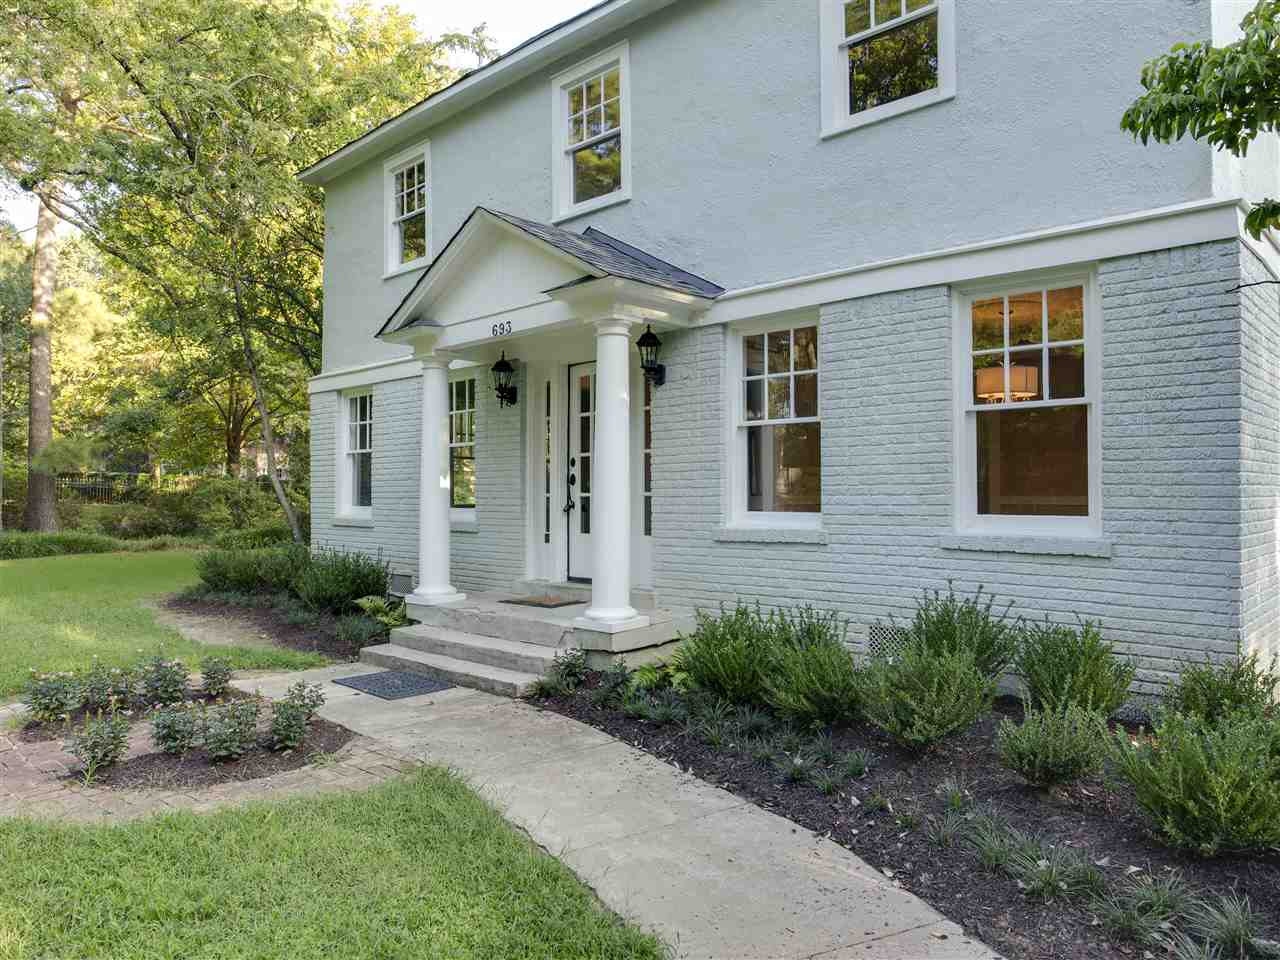 Midtown Memphis Homes for Sale >$200,000